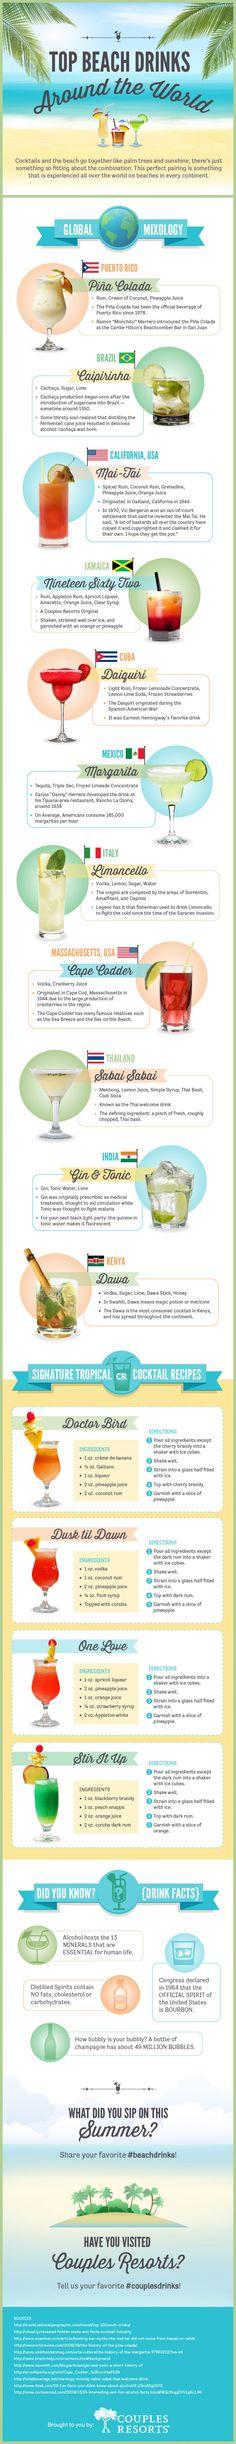 Top Beach Drinks Around the World Infographic for Couples Resorts via IMI. designed by #dezinegirl creative studio 07/14